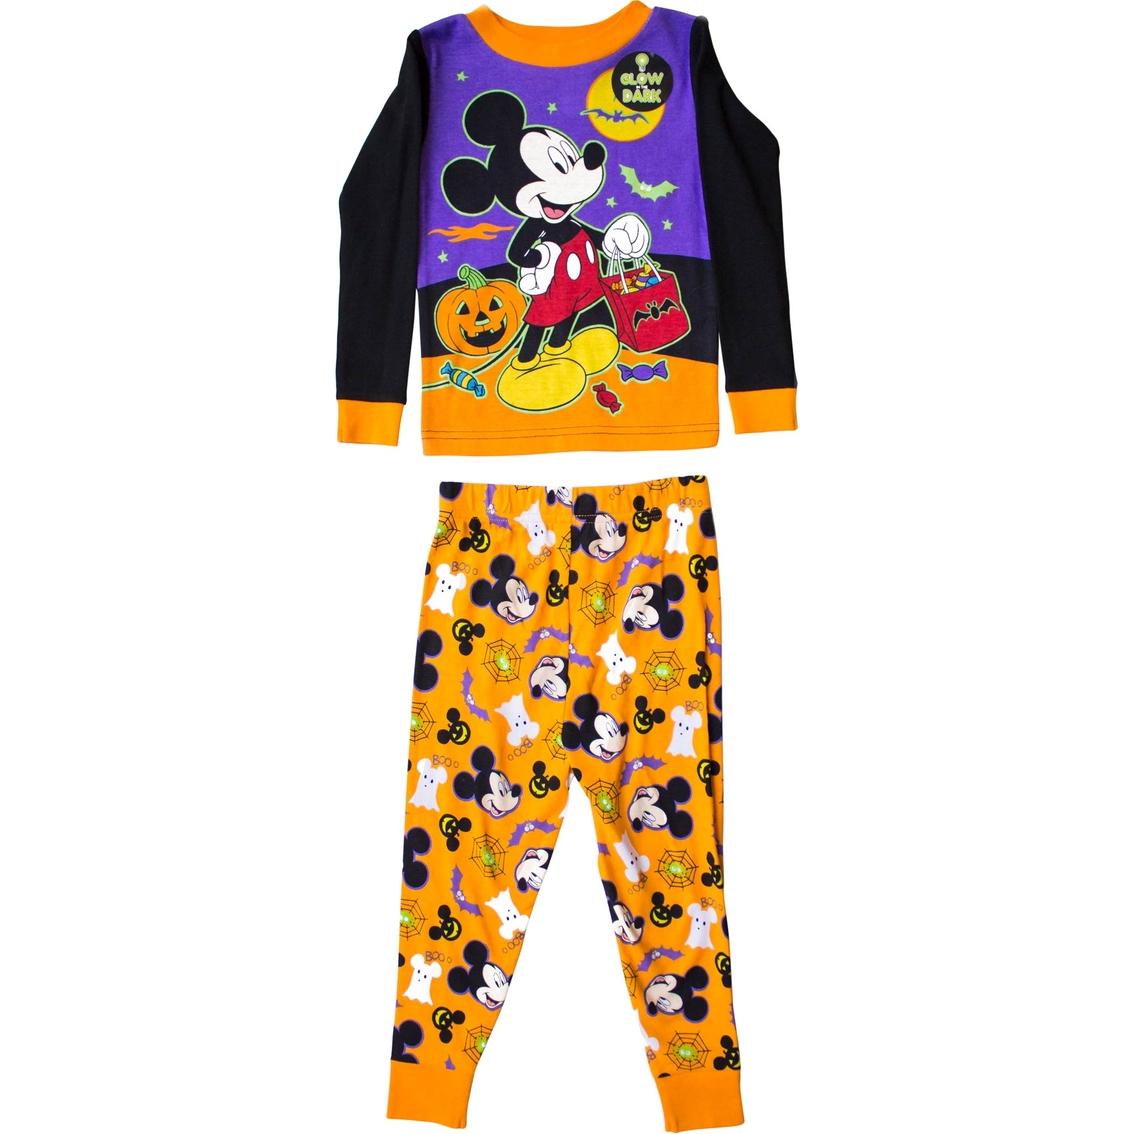 59918c57a Disney Toddler Boys Mickey Mouse Halloween 2 Pc. Pajama Set ...